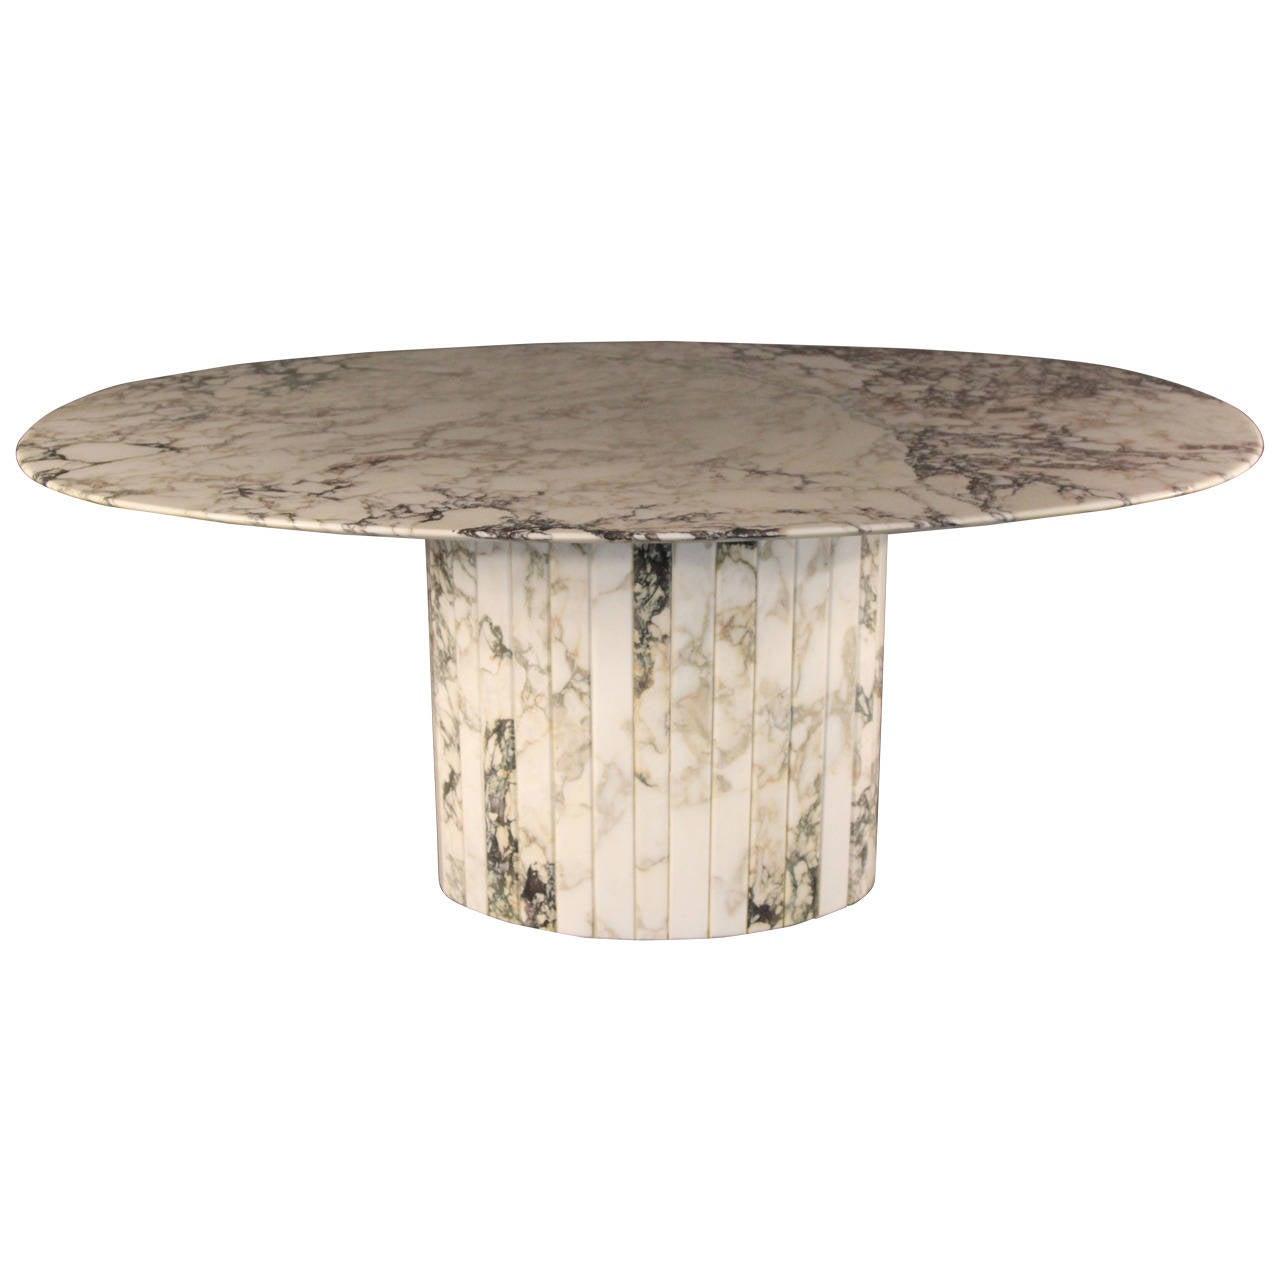 Oval marble dining table - Gorgeous Carrara Marble Oval Dining Table Italian 1